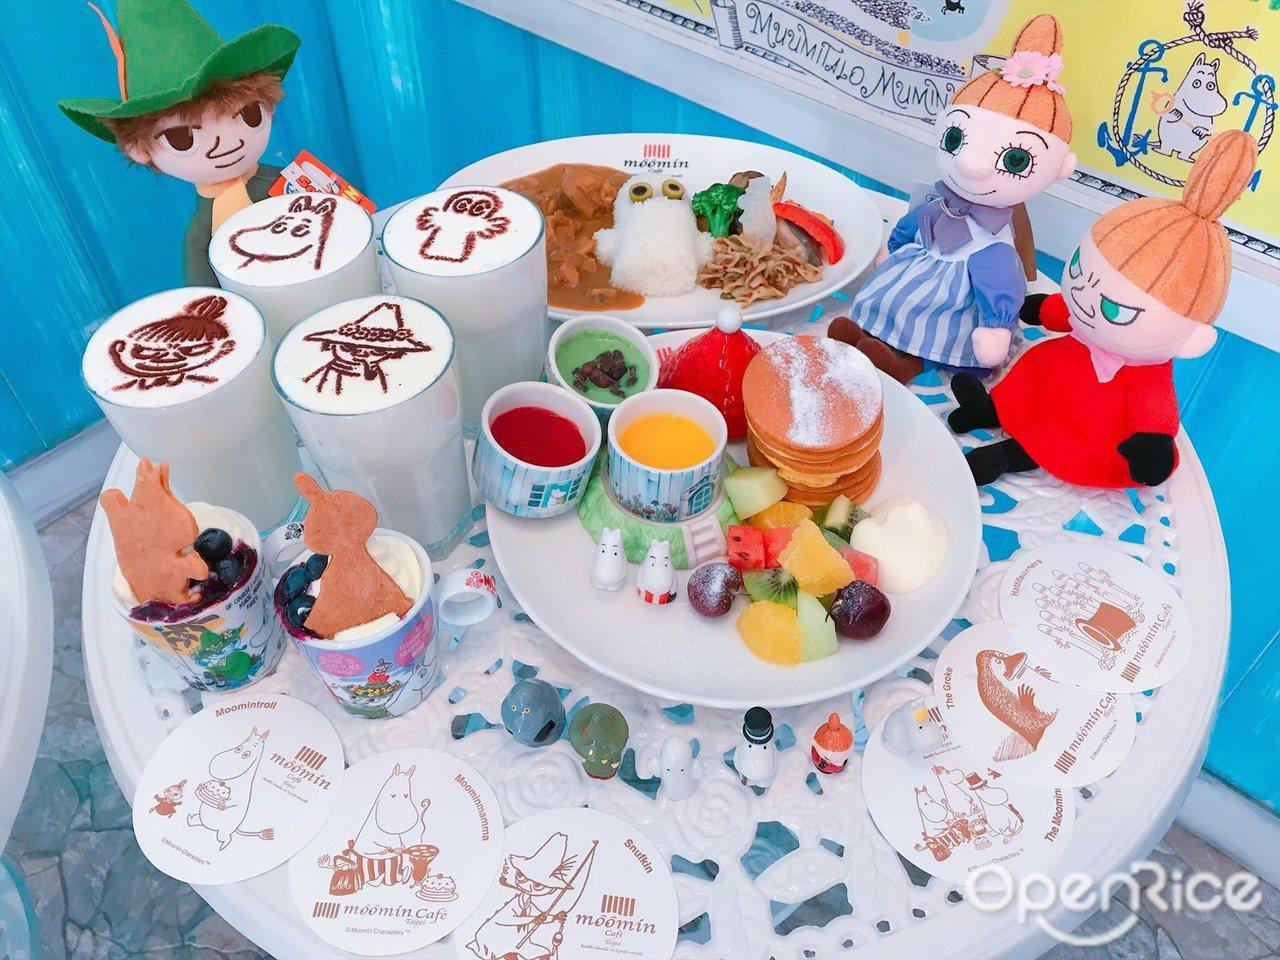 ▲Moomin Café嚕嚕米主題餐廳帶來充滿愛、自由、熱愛生命「嚕嚕米生活法則...